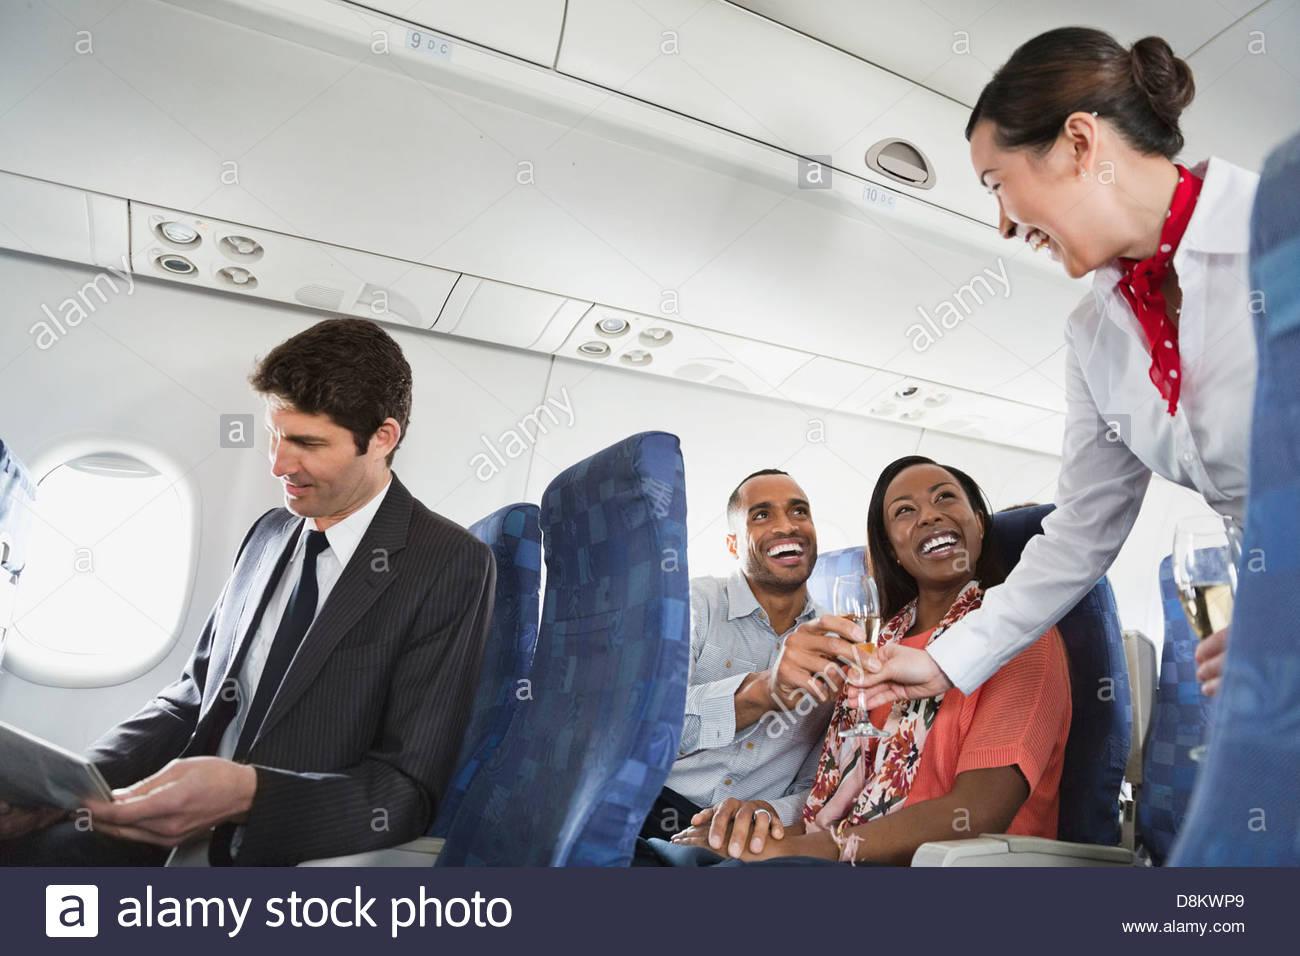 Smiling flight attendant serving drinks to passengers - Stock Image